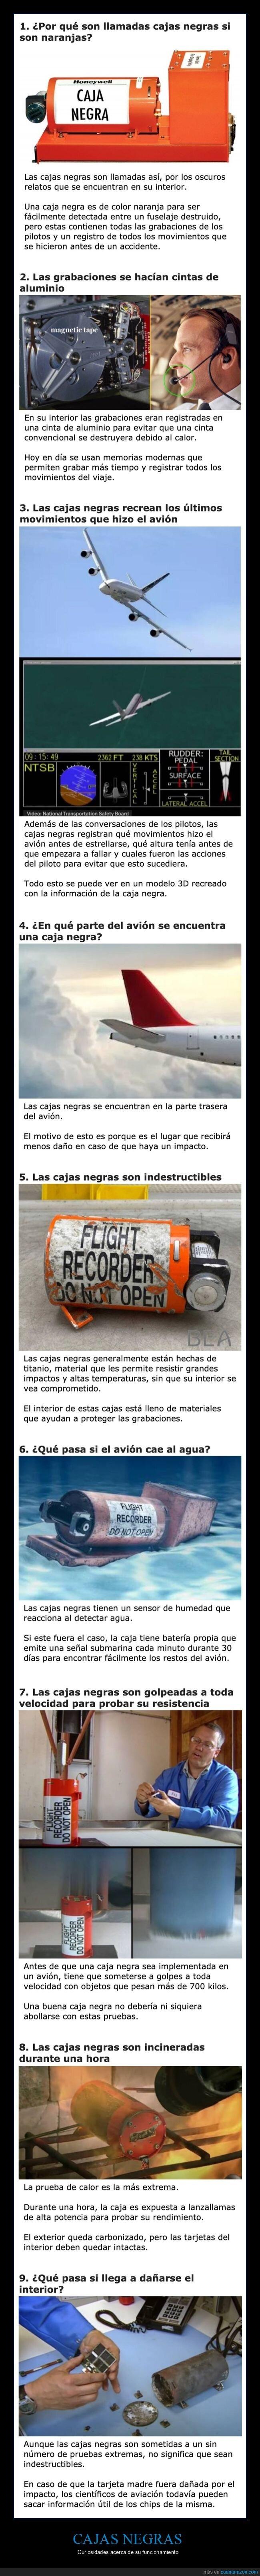 aviones,caja negra,curiosidades